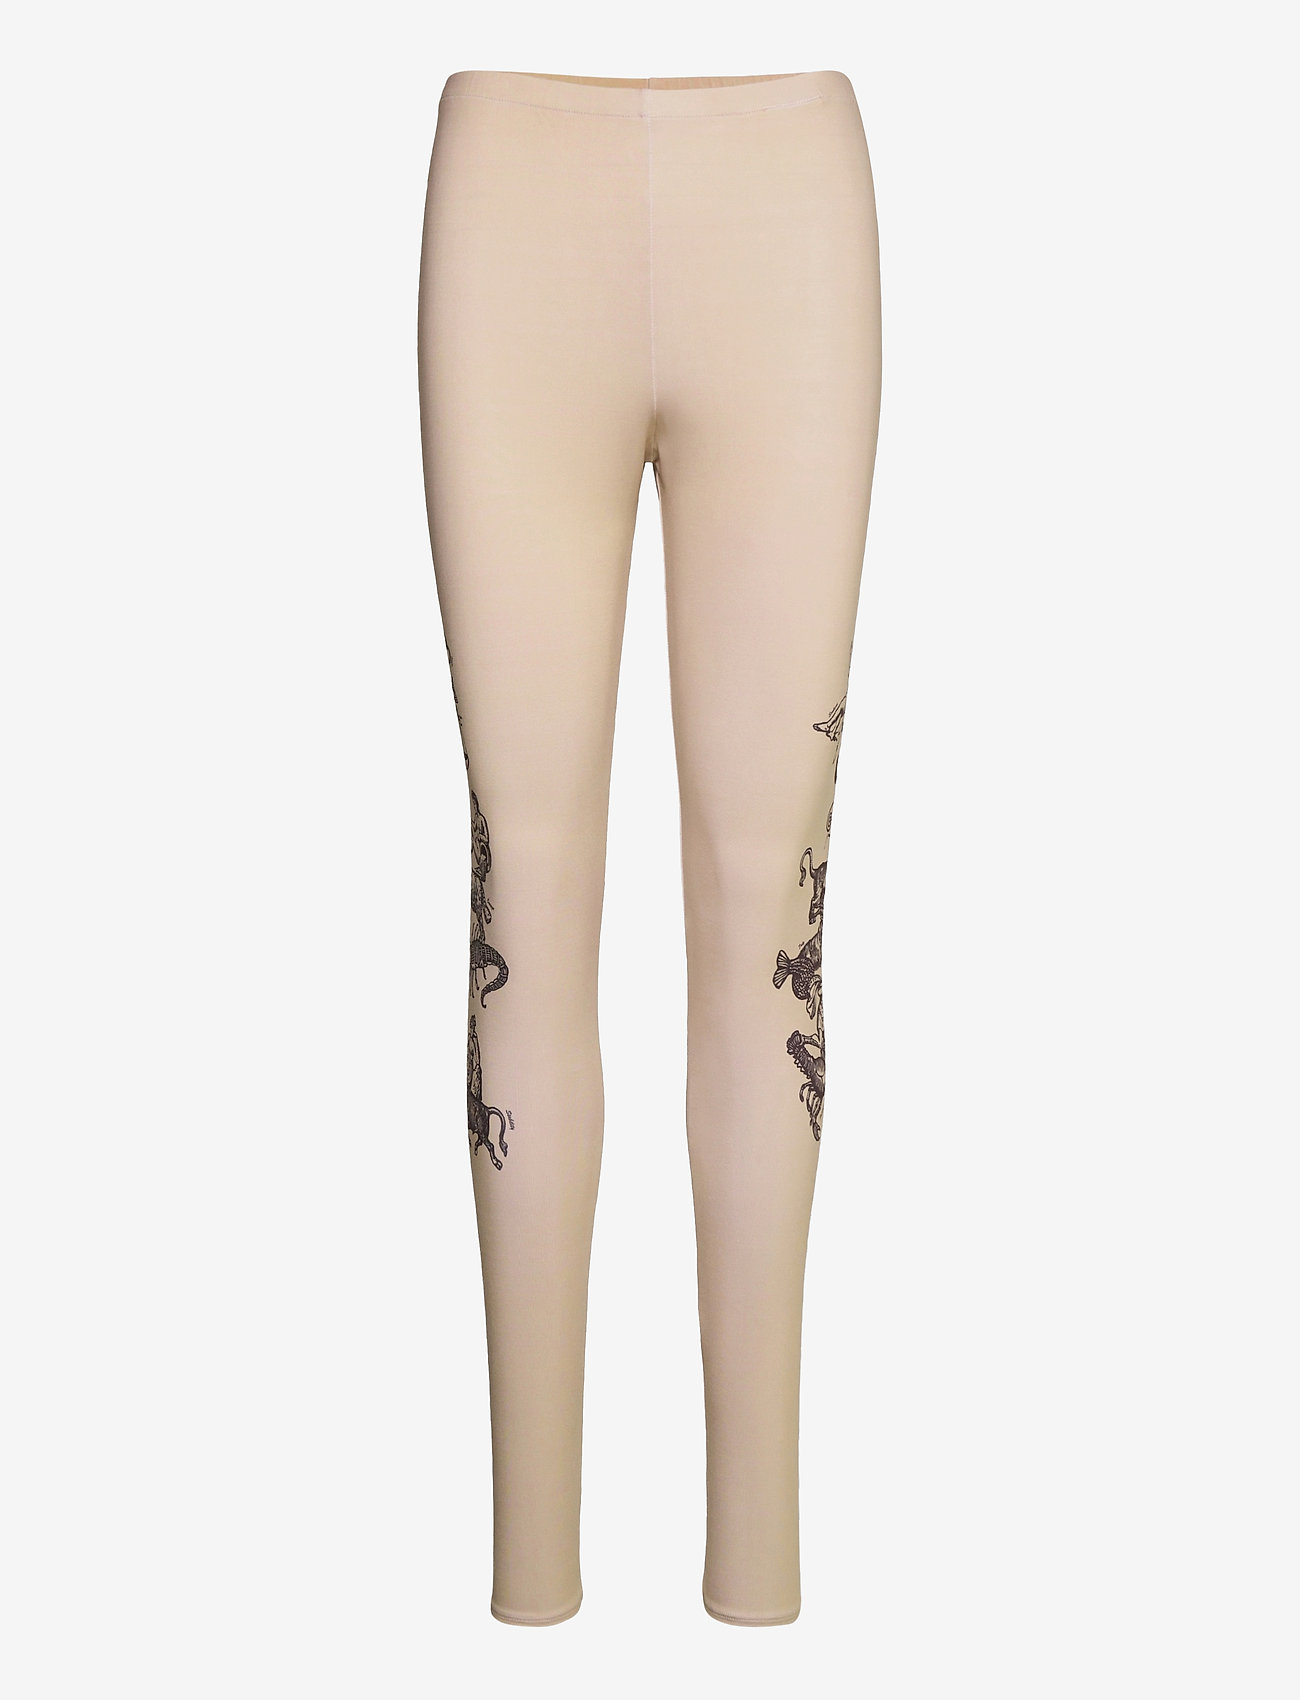 Soulland - Ying leggings - leggings - beige - 1